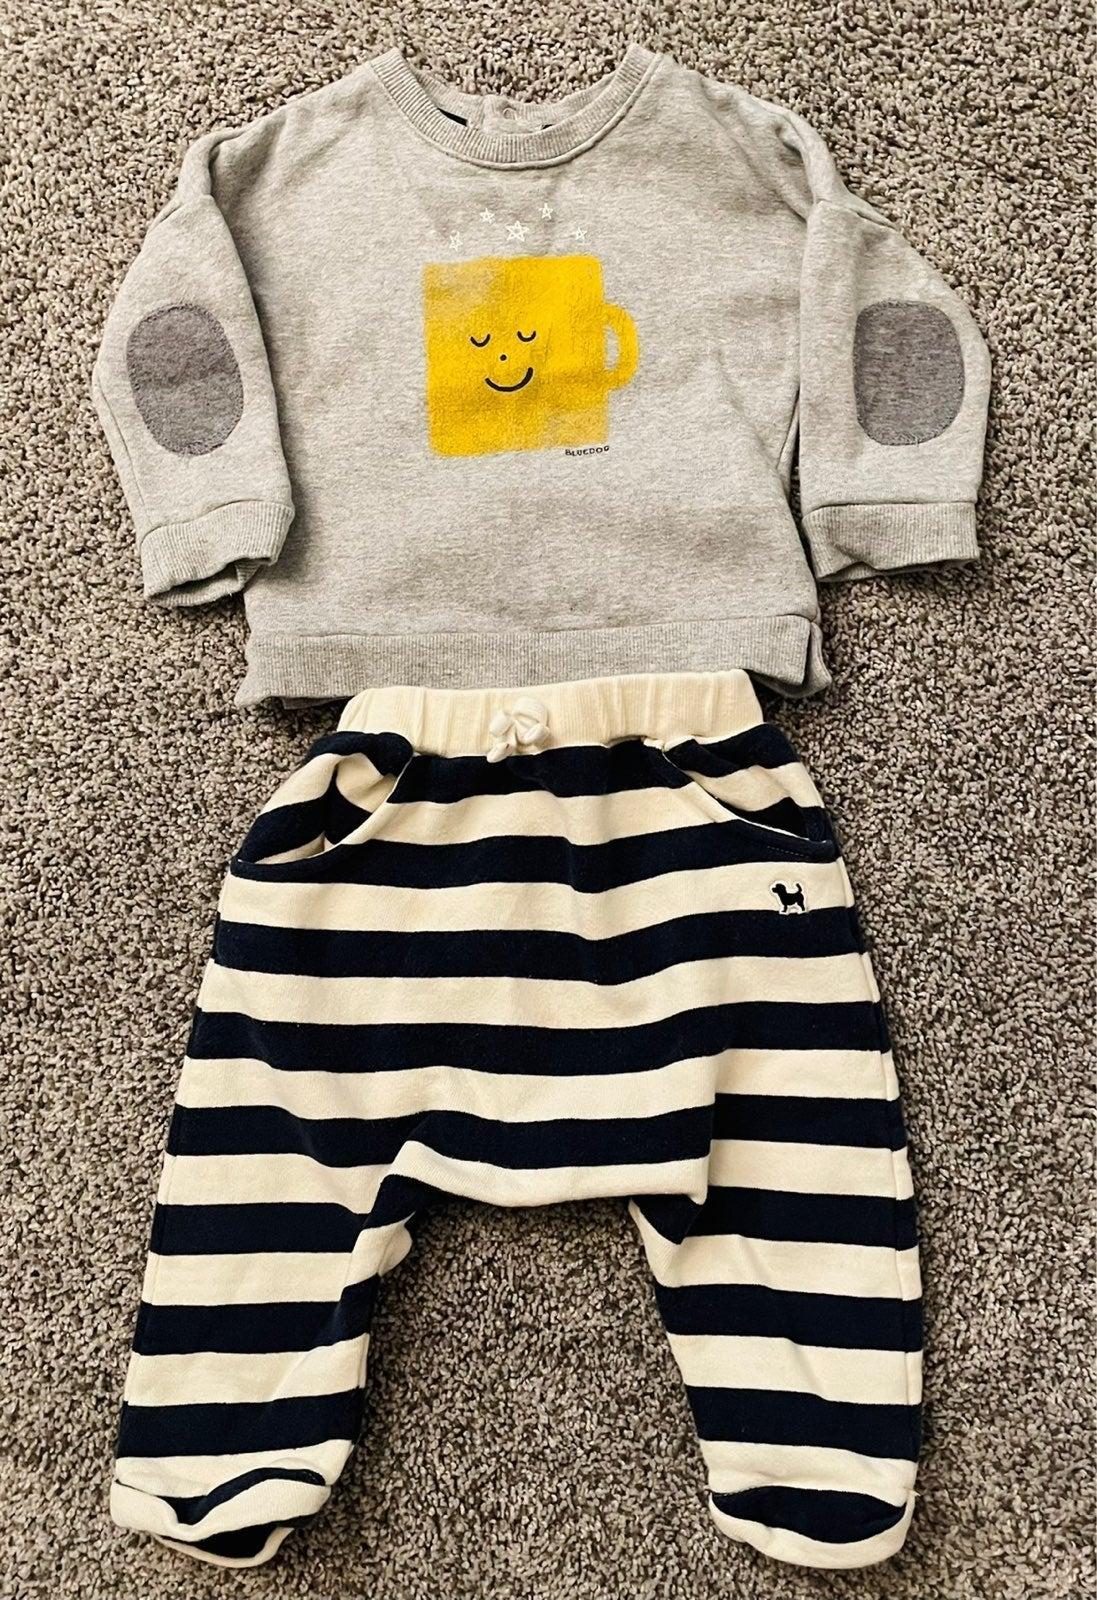 Bluedog sweater + striped sweatpants